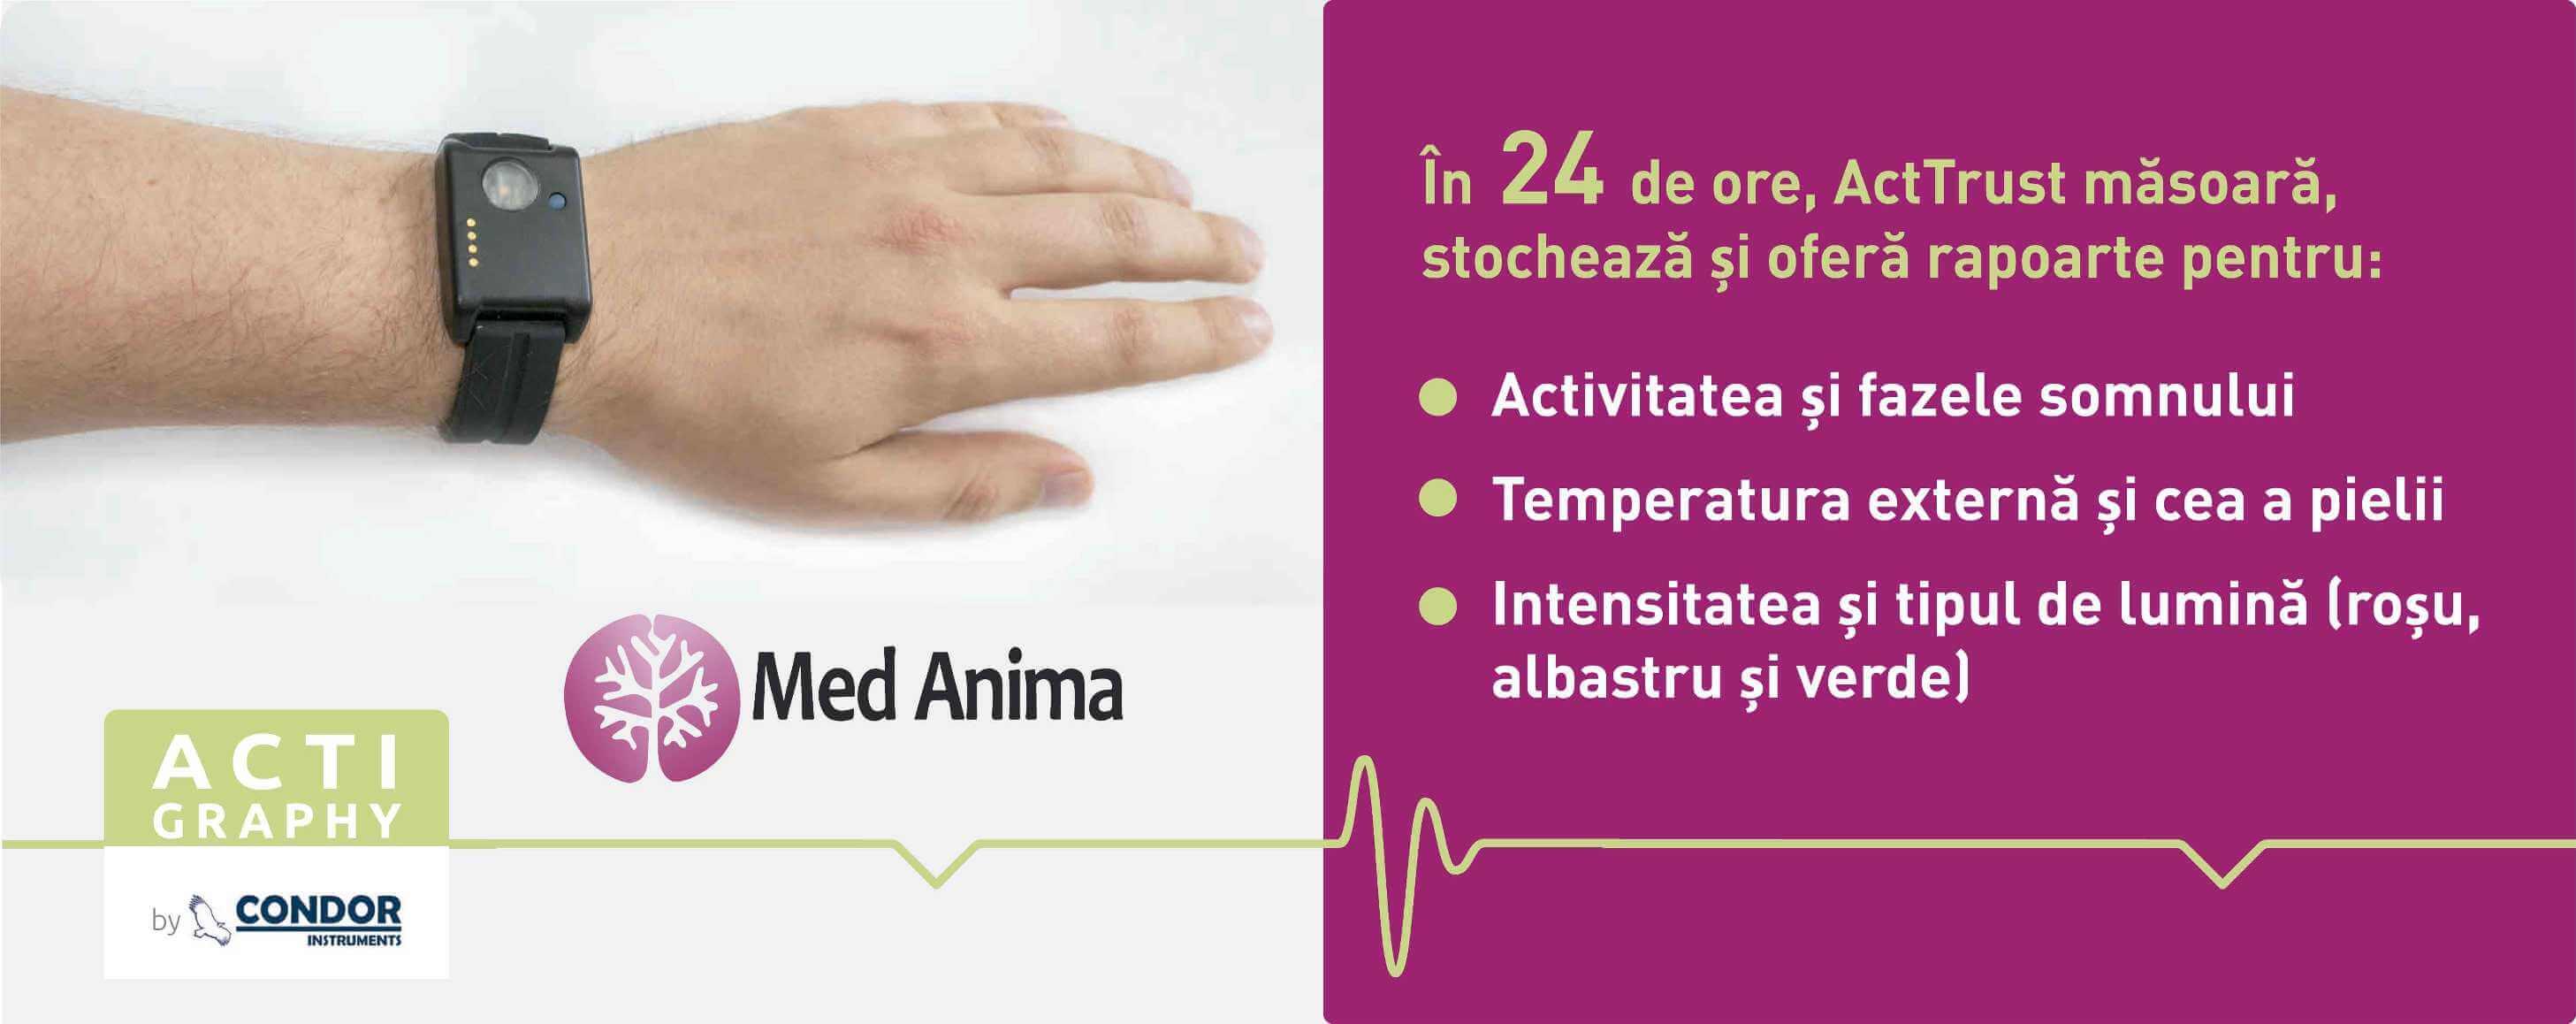 ActTrust dispozitiv monitorizare somn iasi Med Anima